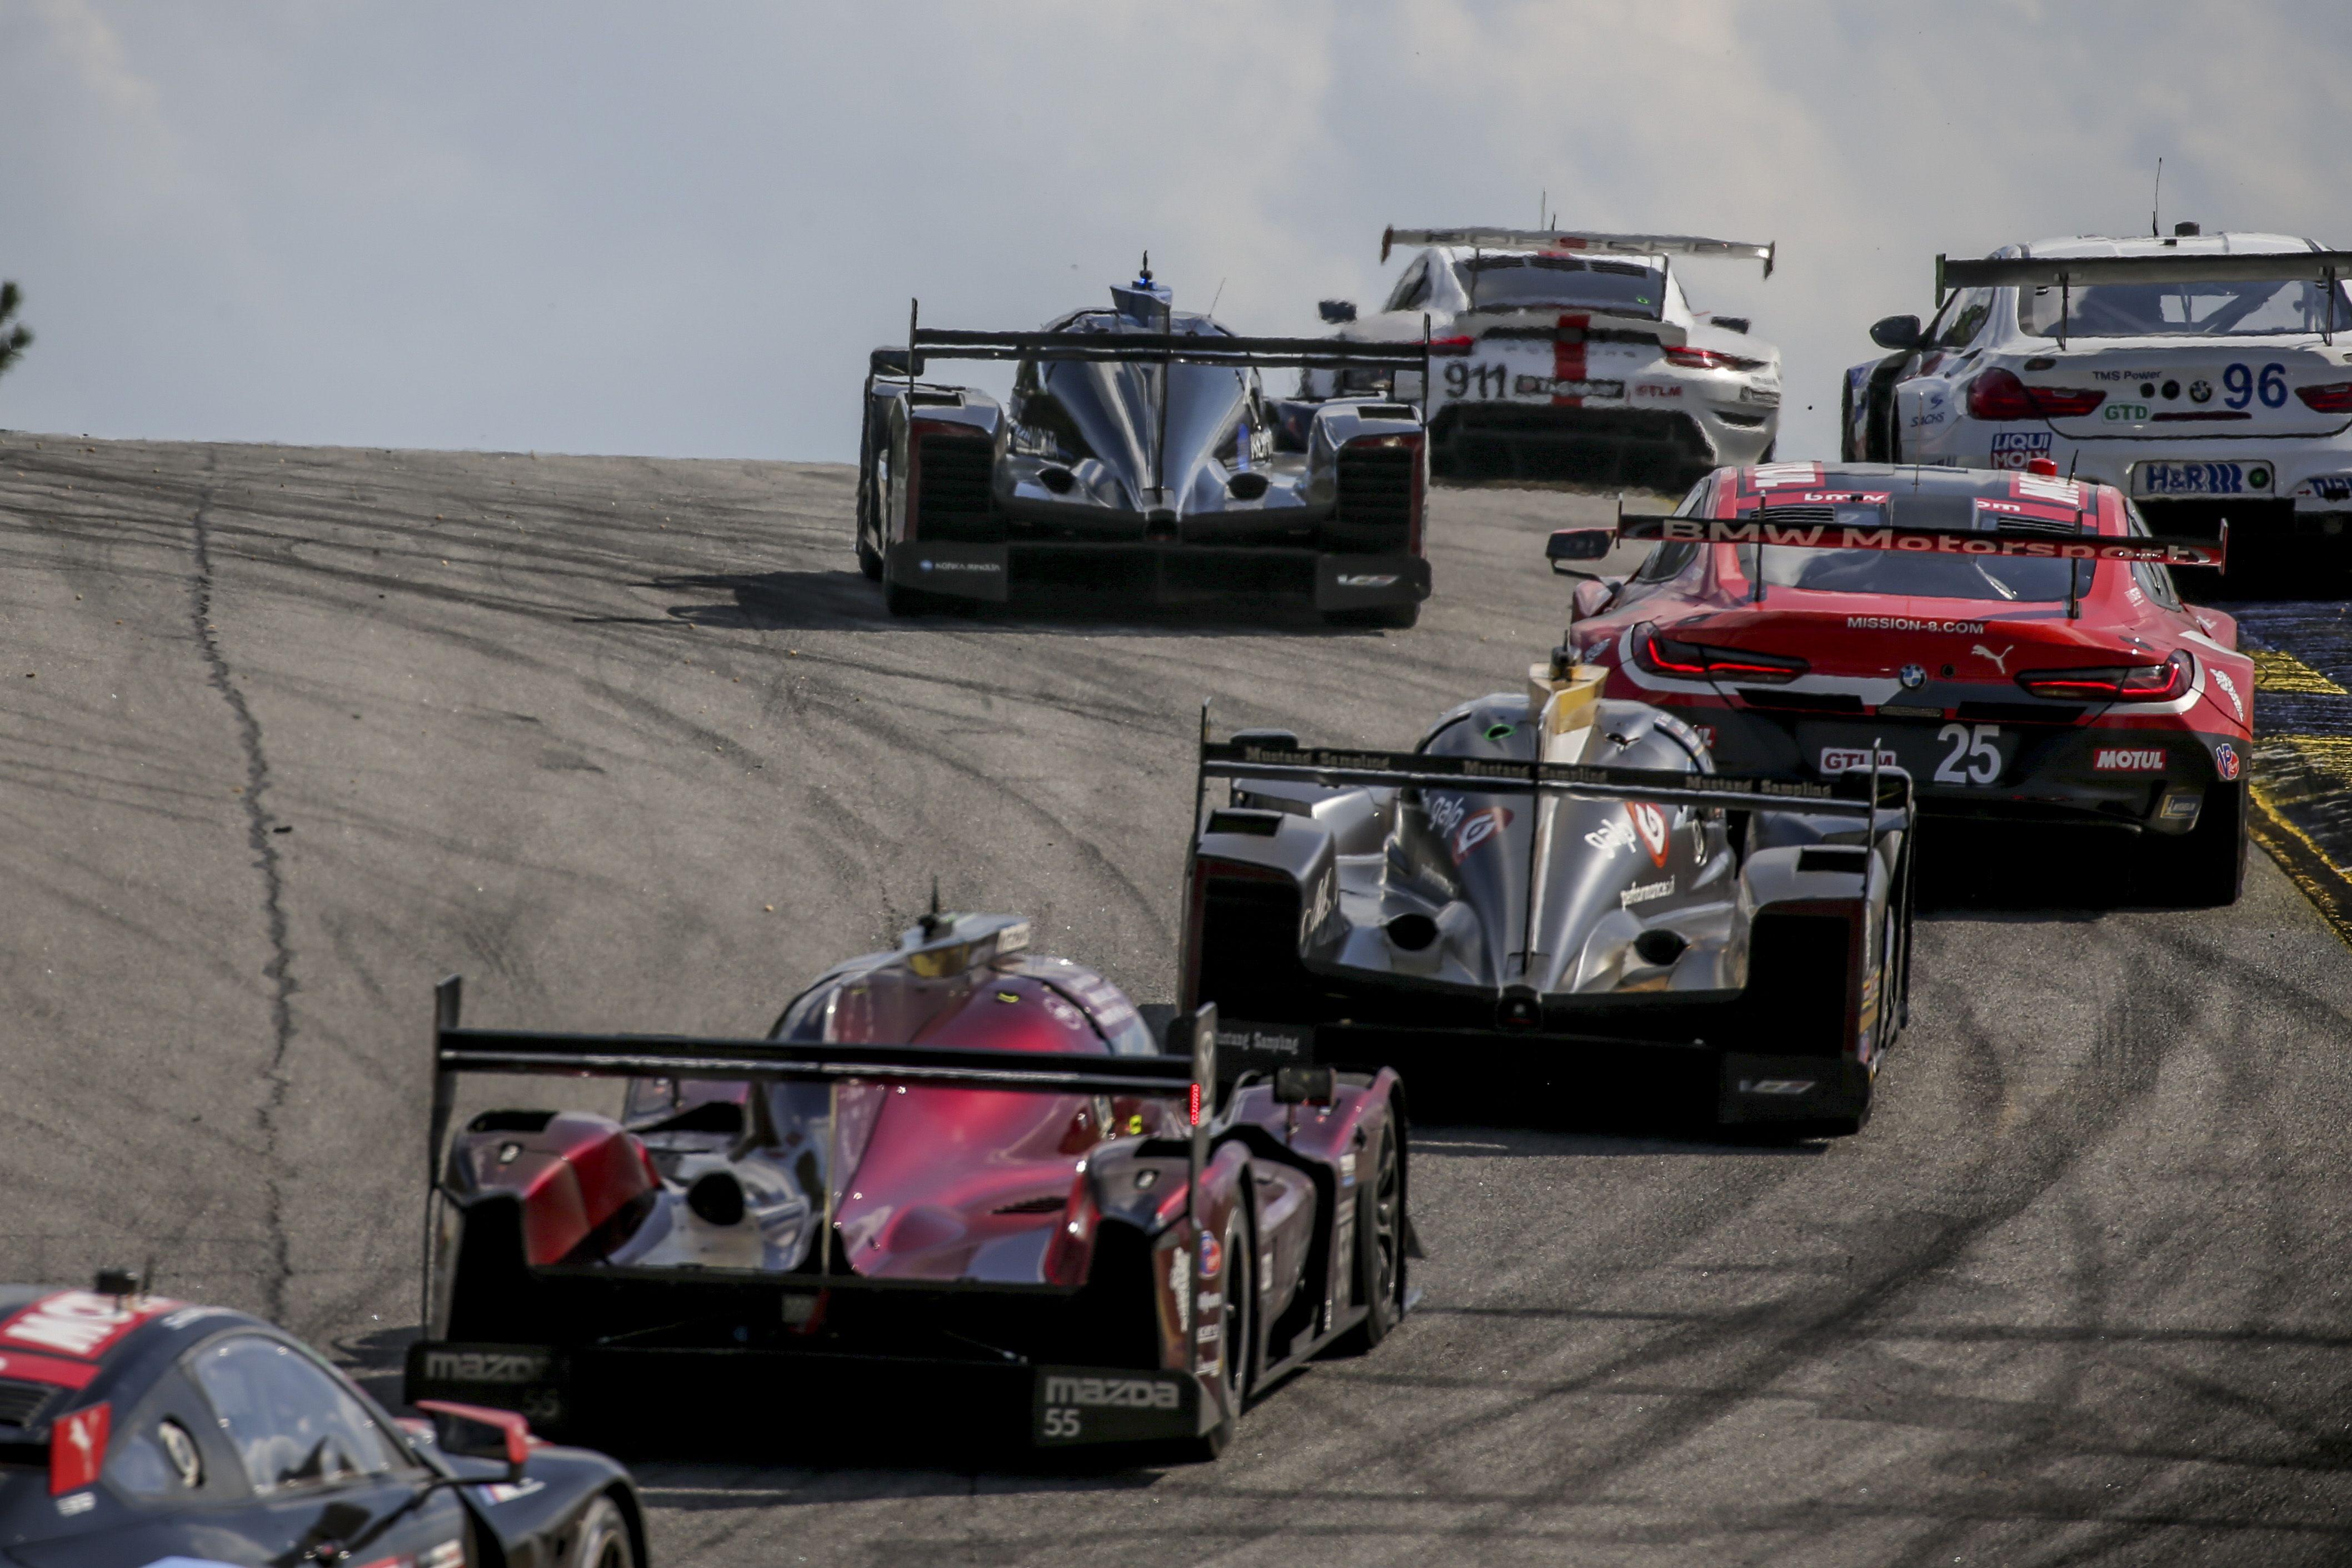 #7 Acura, #3 Corvette Lead Petit Le Mans at Halfway